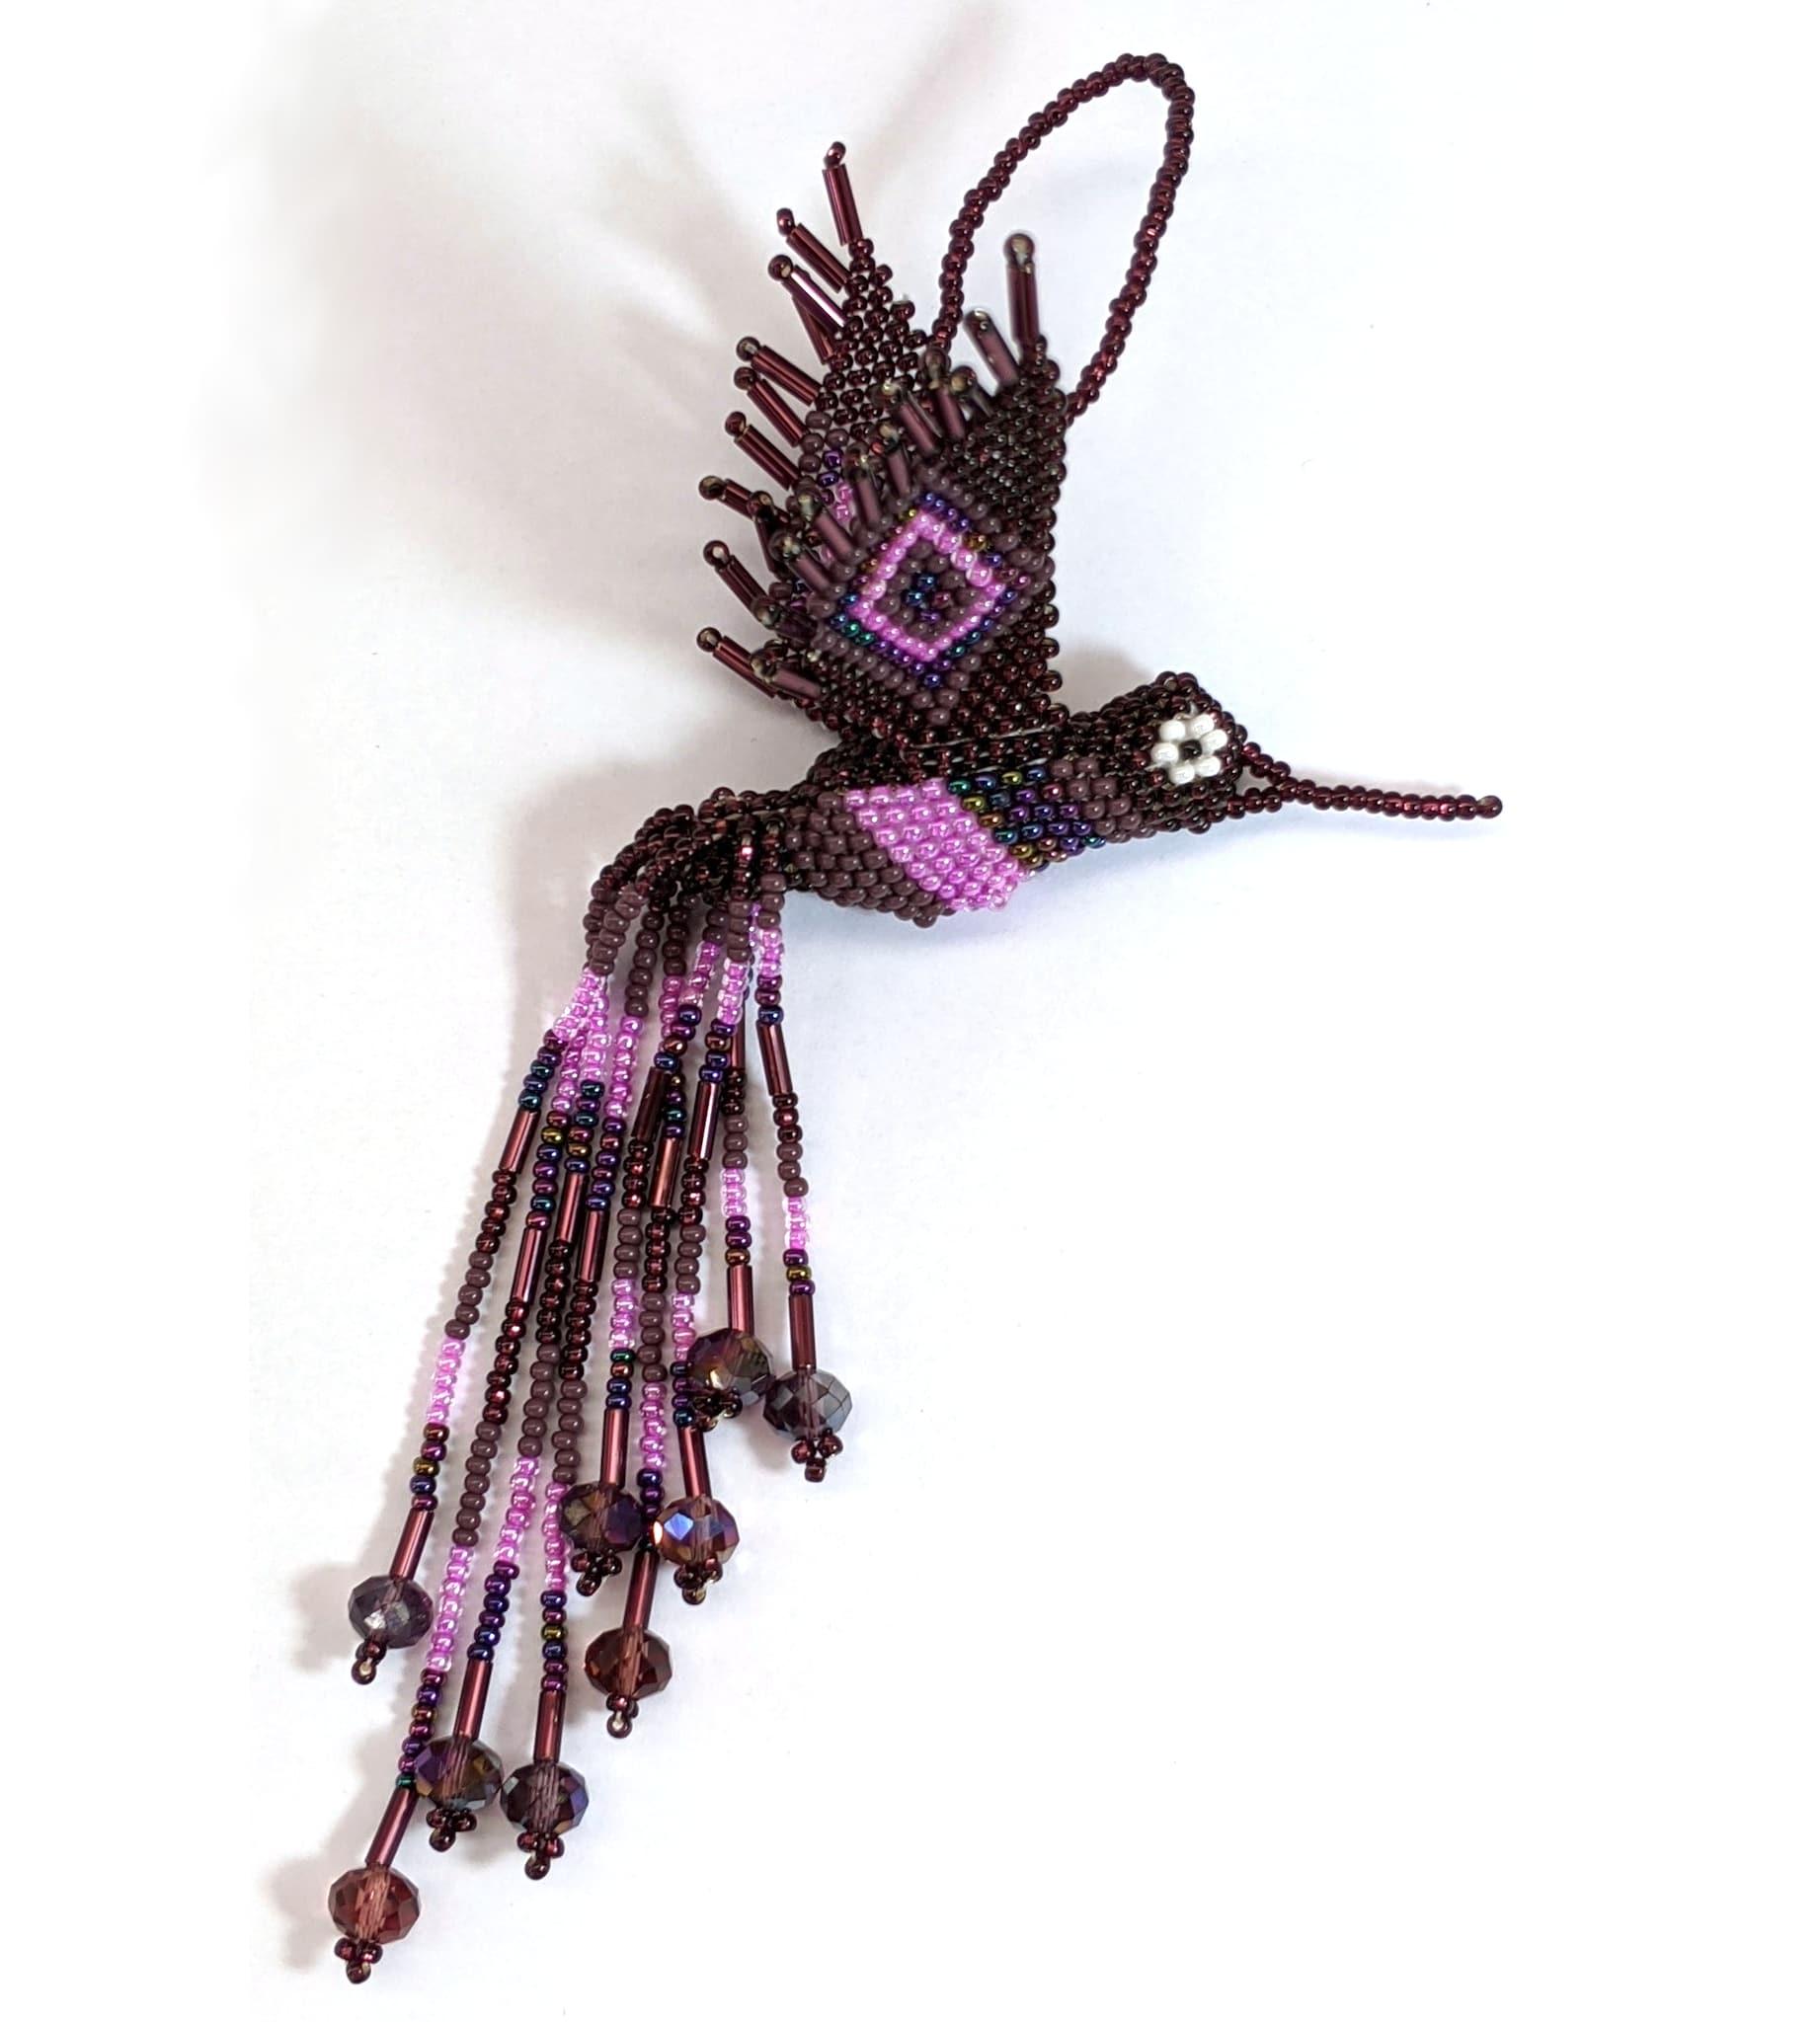 Hummingbird Beaded Ornament - Purples